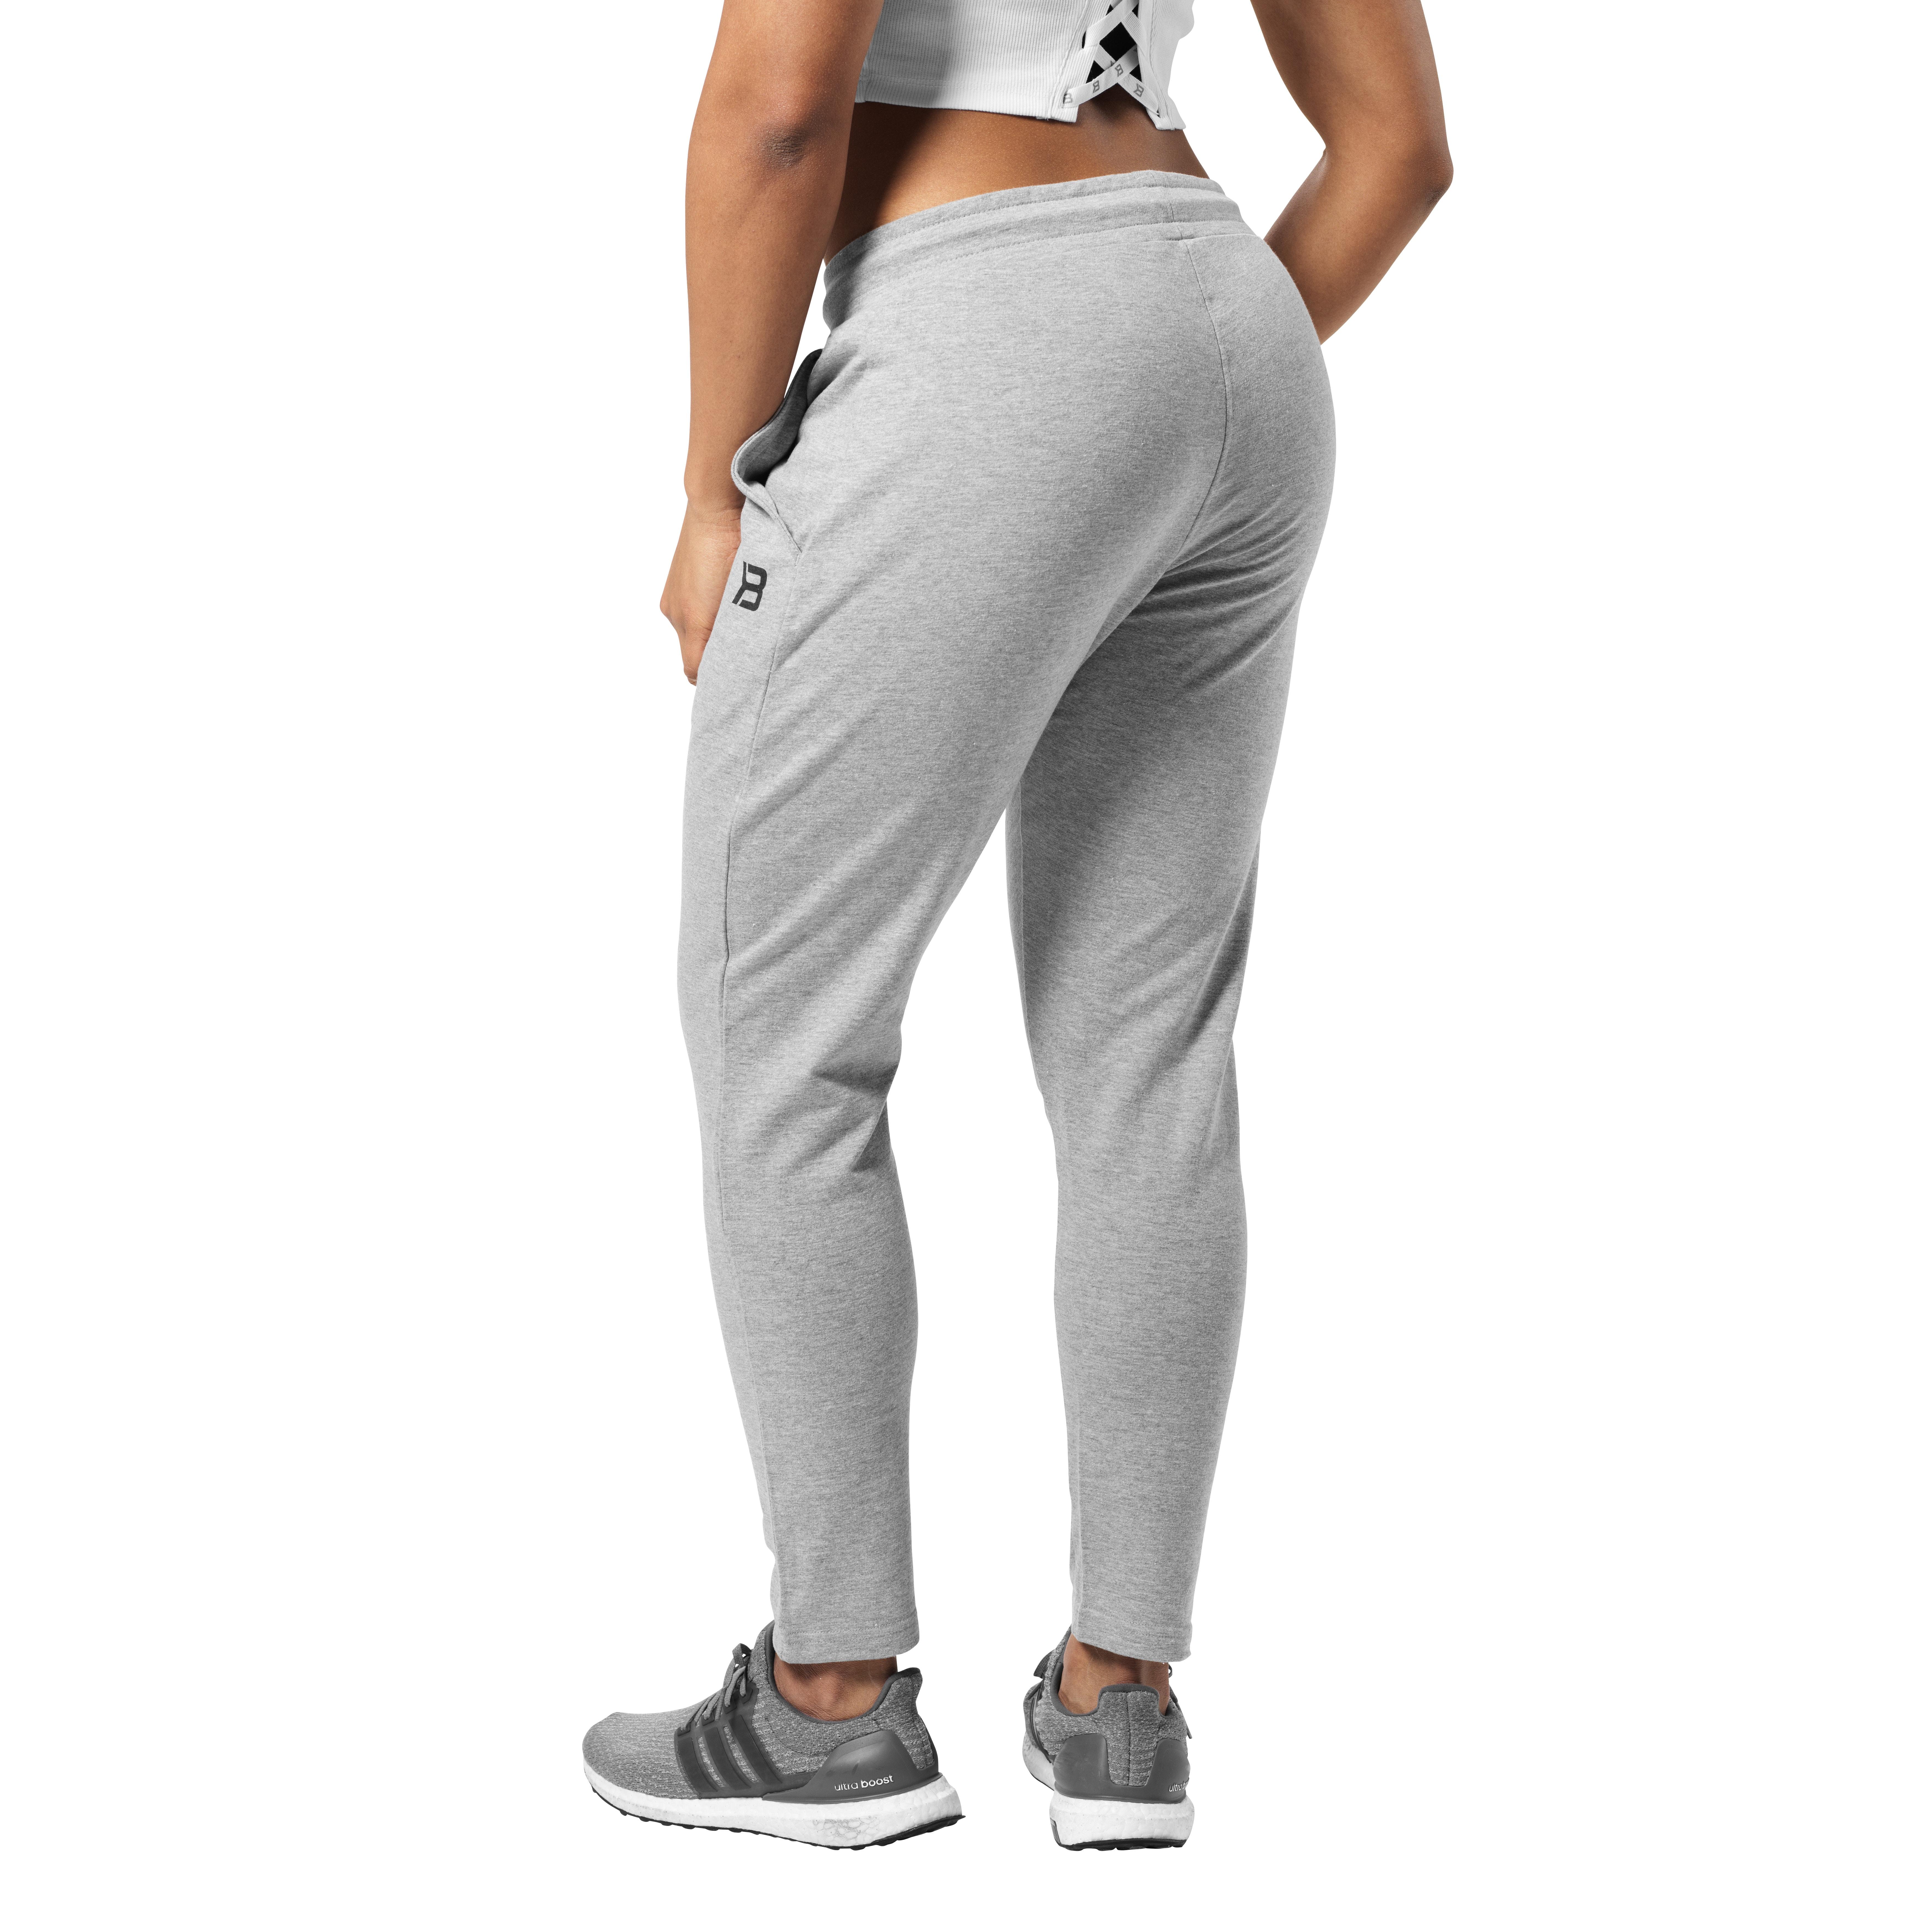 Better Bodies Astoria Sweat Pants Greymelange Tights.no